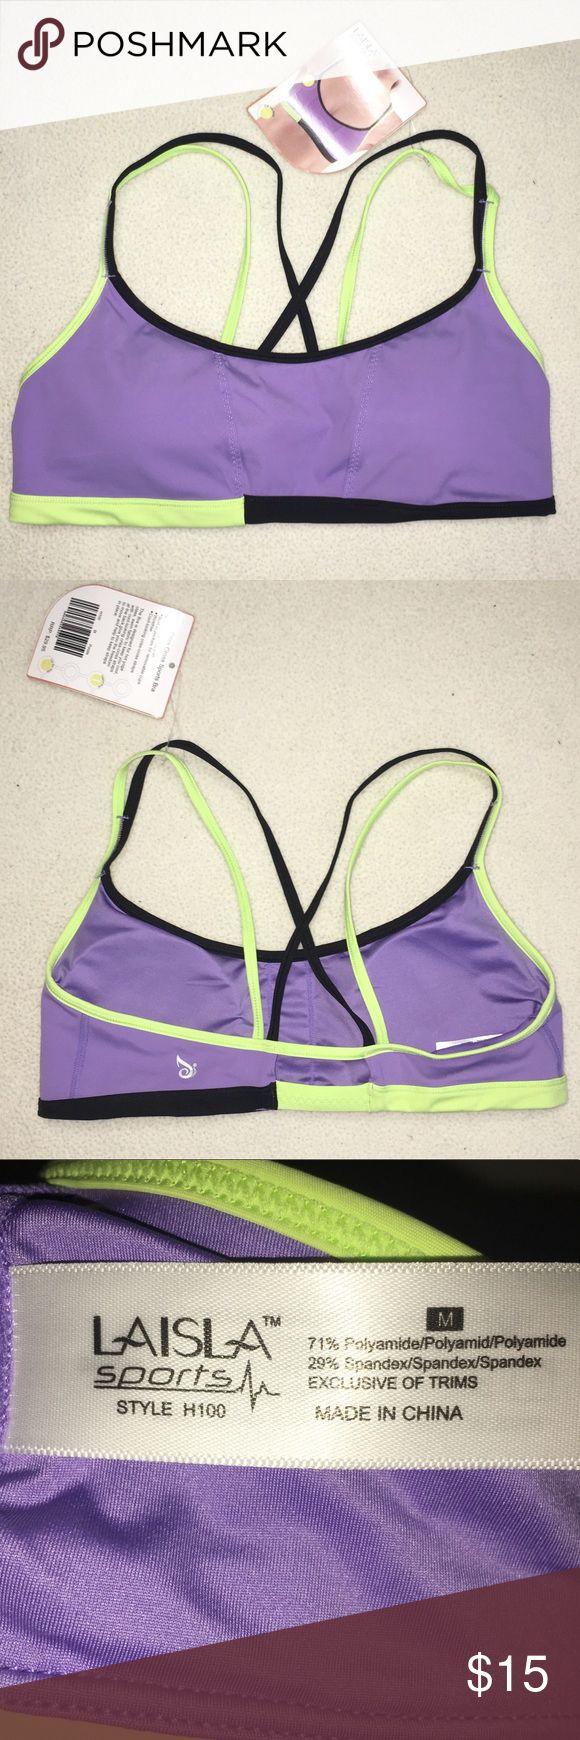 Strappy Sports Bra LAISLA SPORT size medium Purple sports bra with strappy cross-cross back. MEDIUM. LAISLA SPORT. NWT 😄 Has removable pads. Straps are not adjustable. Laisla Intimates & Sleepwear Bras